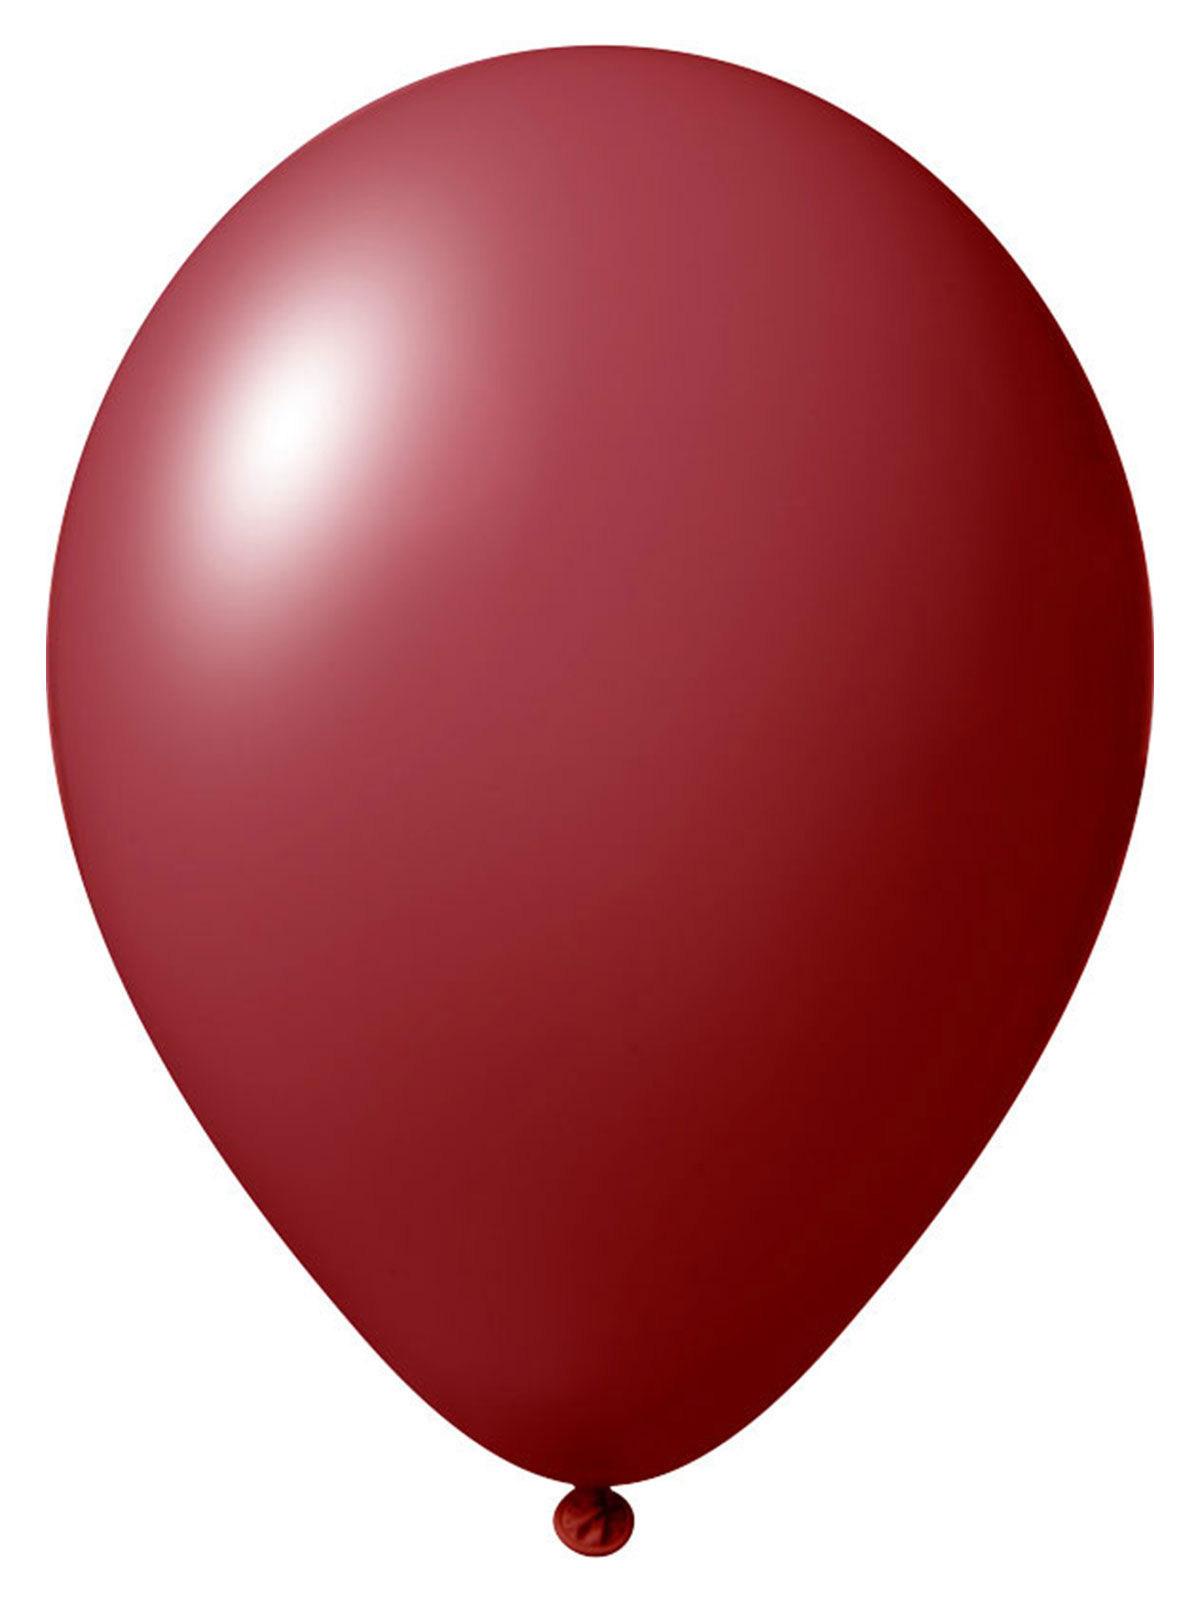 luftballon set 24 st ck ballons party deko weinrot 33cm. Black Bedroom Furniture Sets. Home Design Ideas